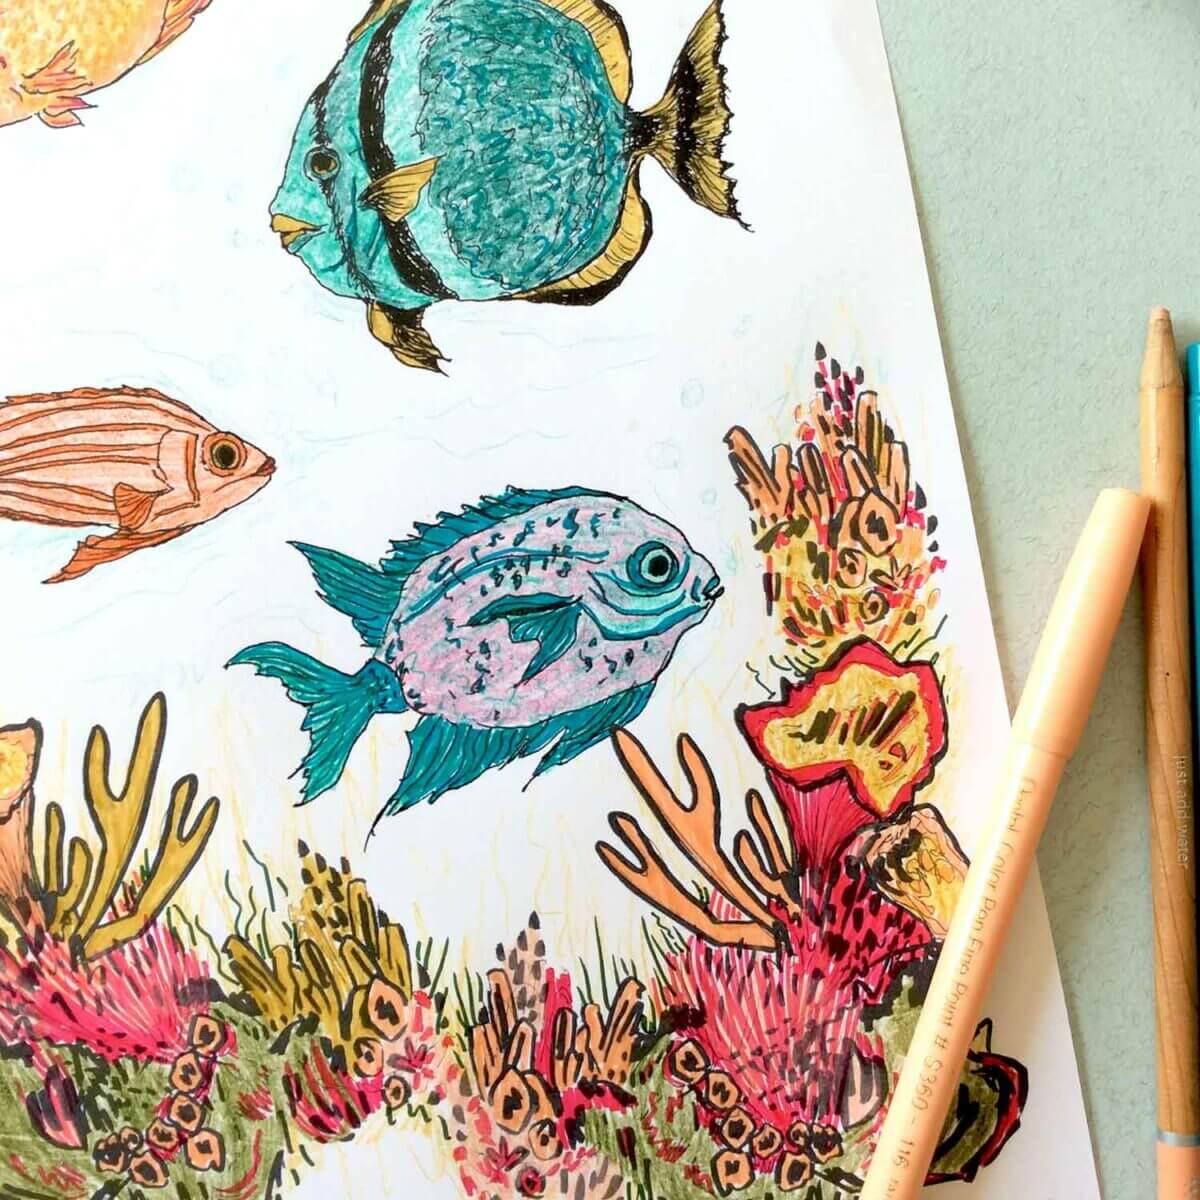 Under-The-Sea-Colouring-Sheet-Blue-Fish-Sky-Siouki